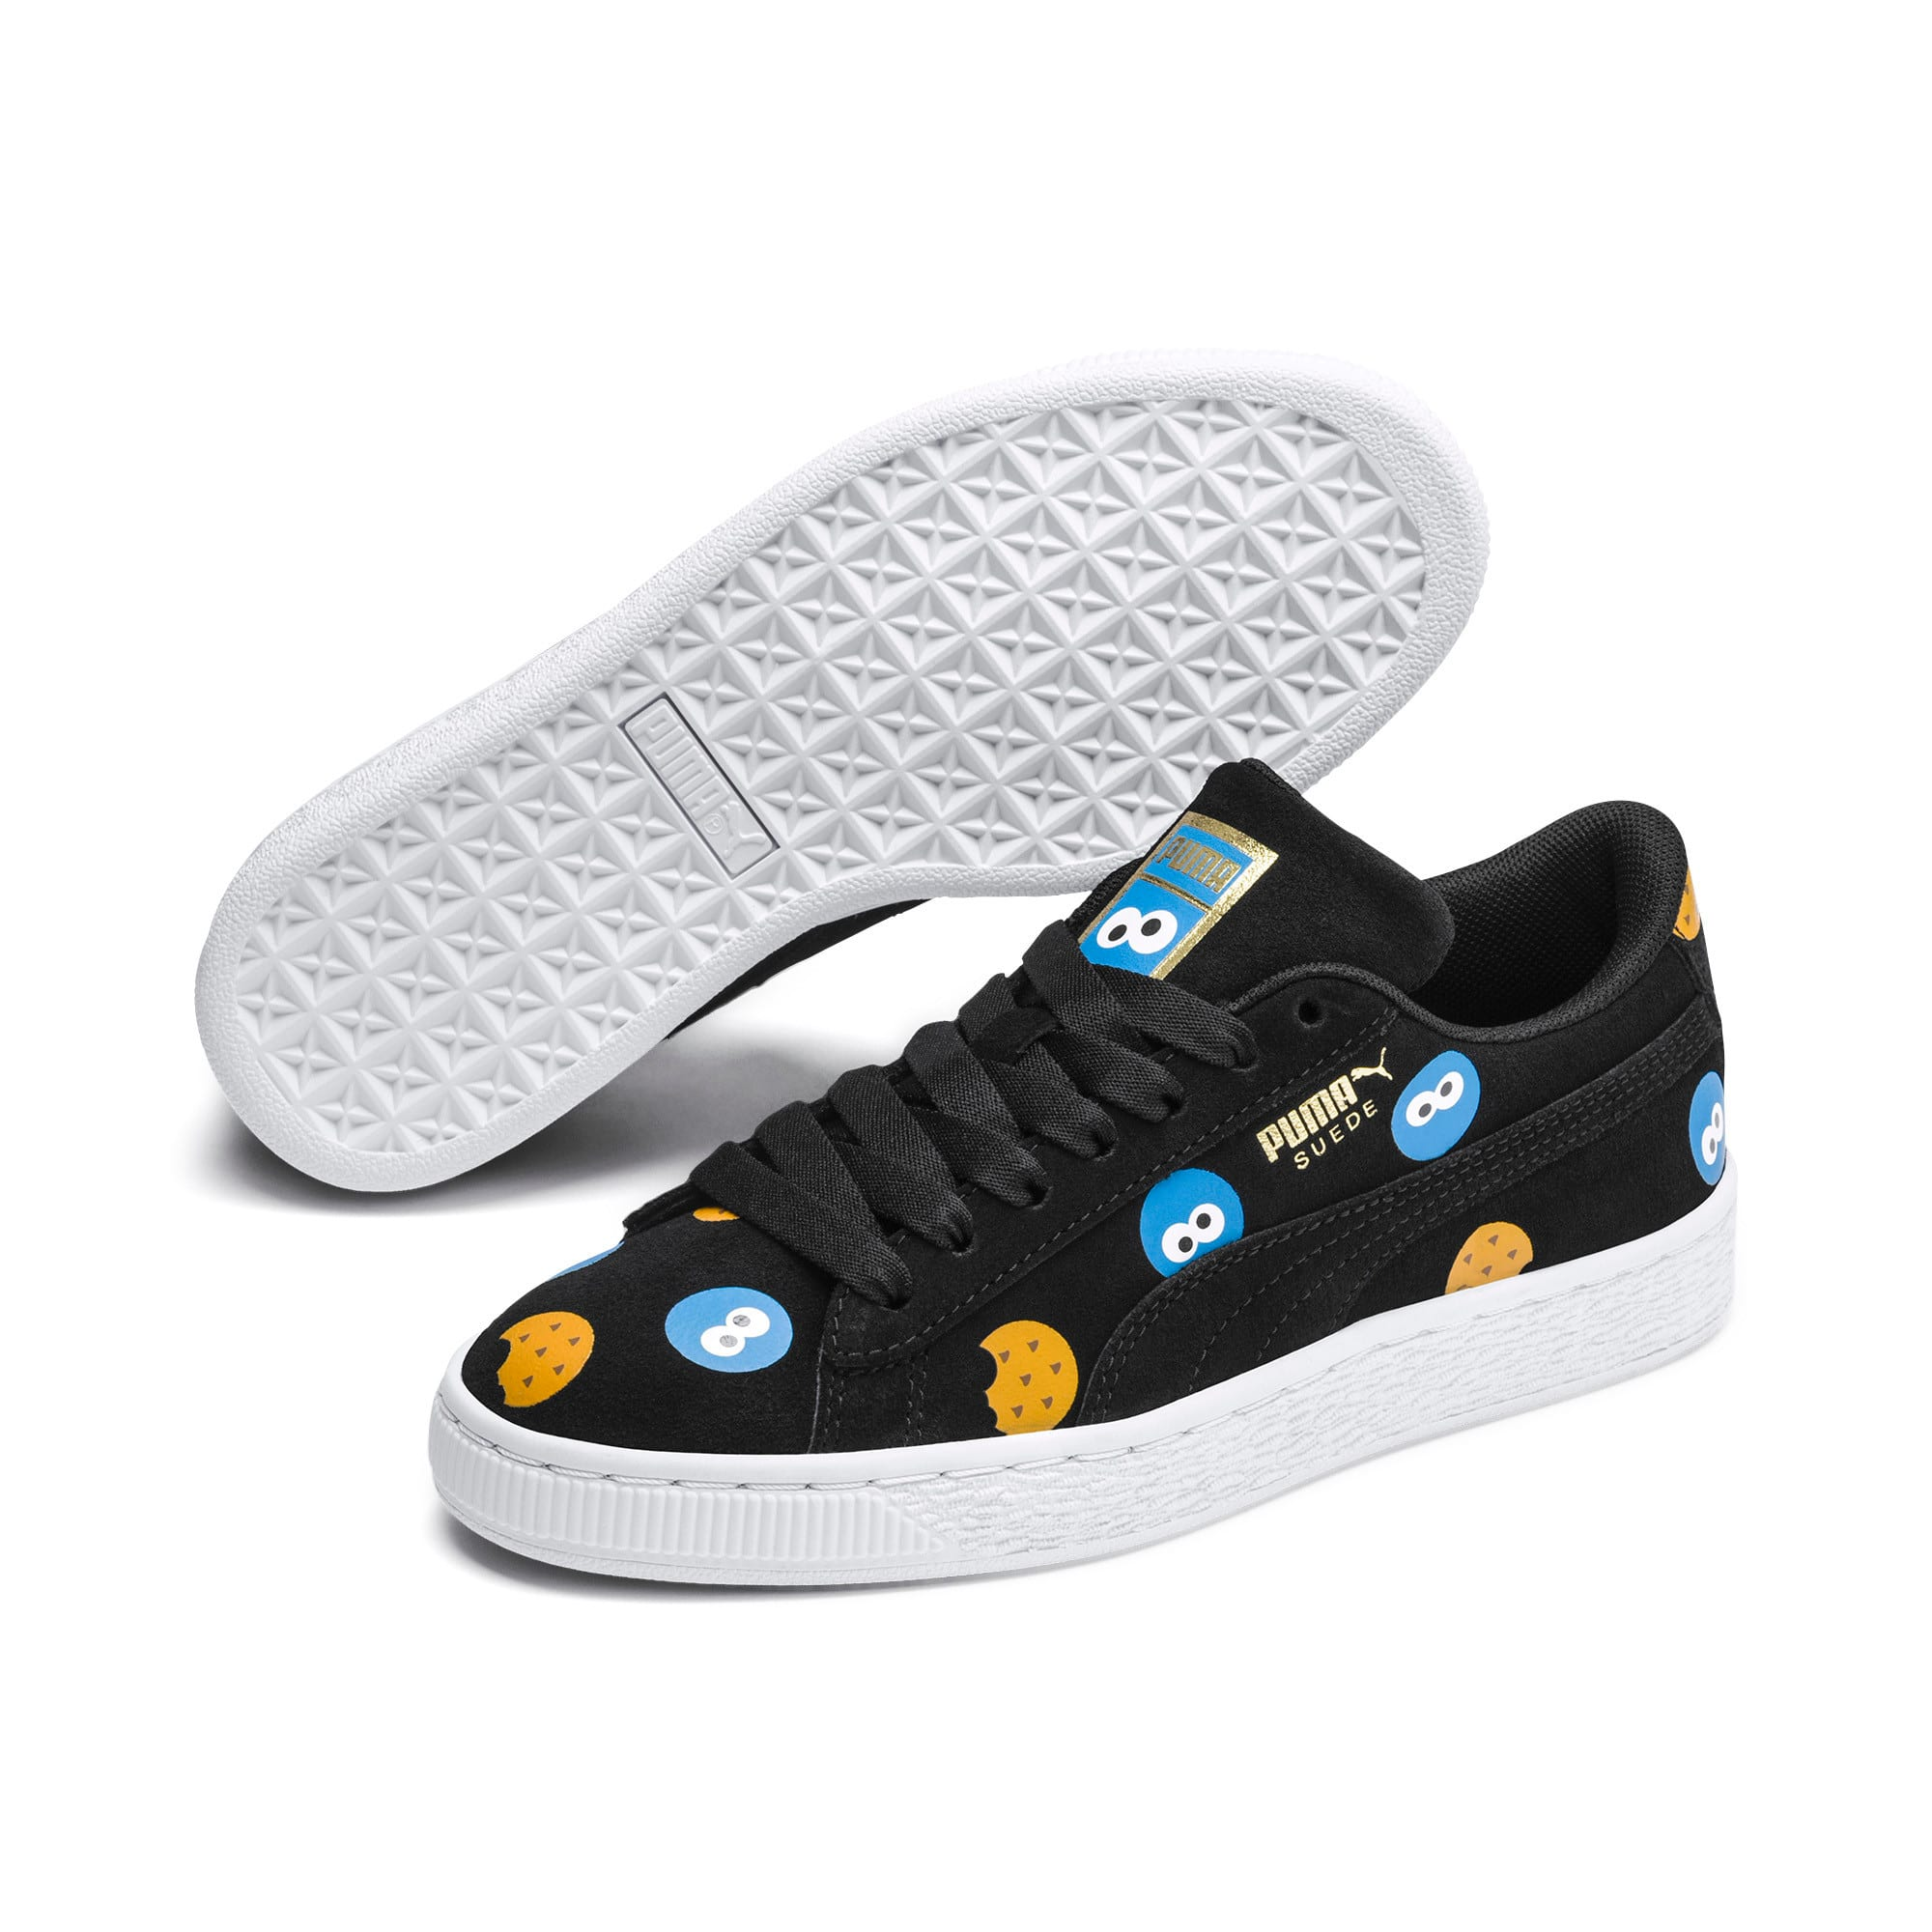 Thumbnail 4 of PUMA x SESAME STREET 50 Suede Badge Sneakers JR, Puma Black-Bleu Azur, medium